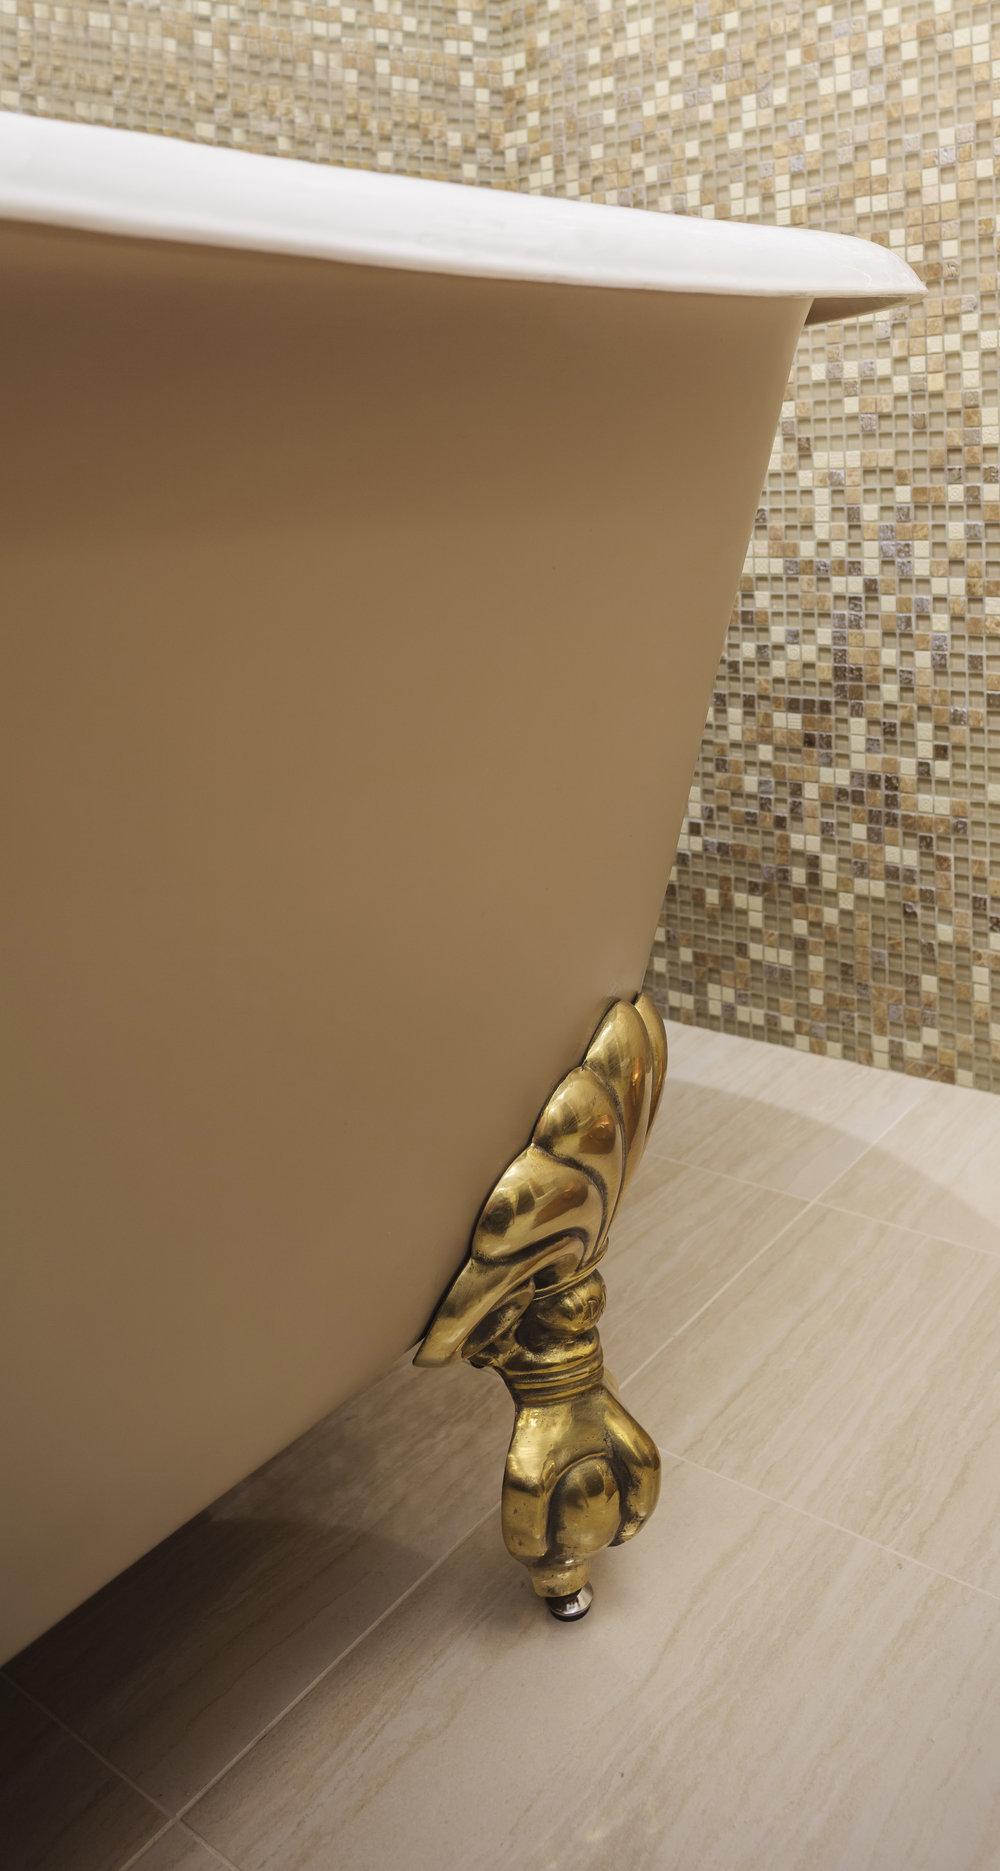 gold claw foot bathtub new orleans designers khb interiors